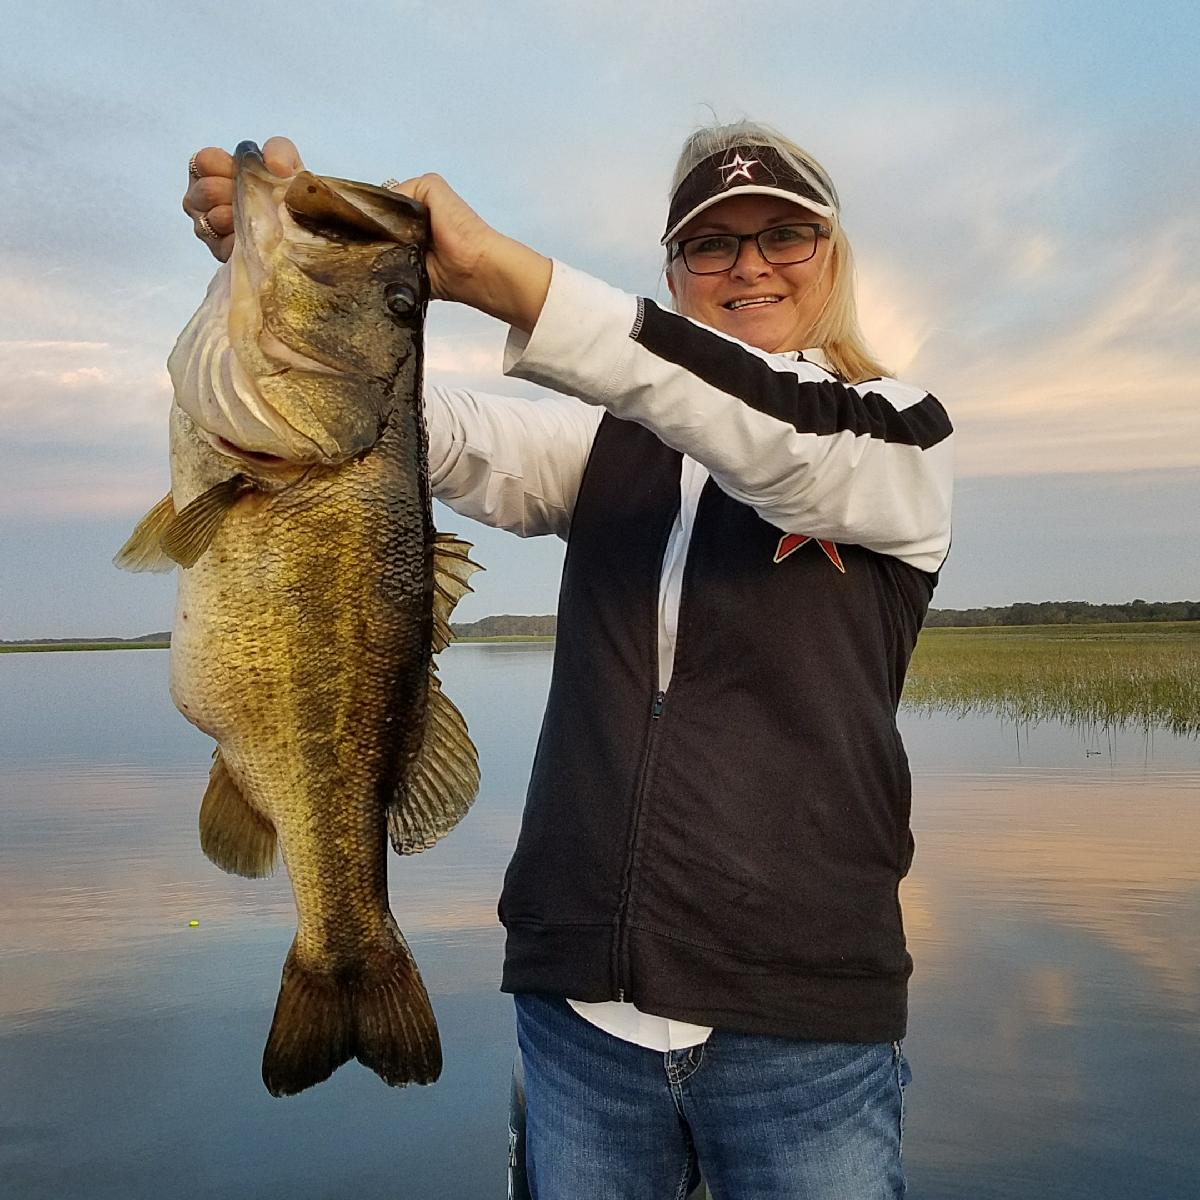 Giant Lake Toho bass